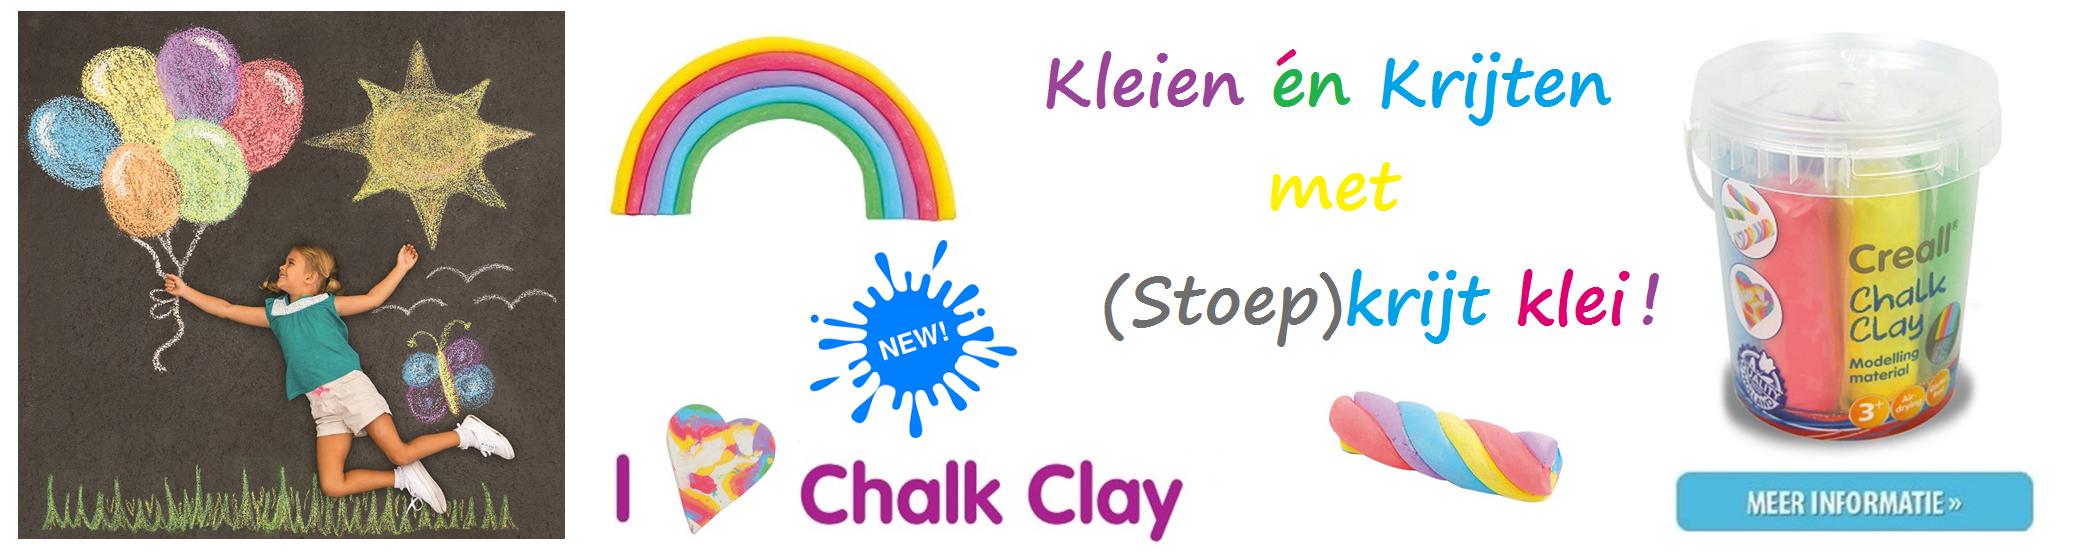 Creal Chalk Clay